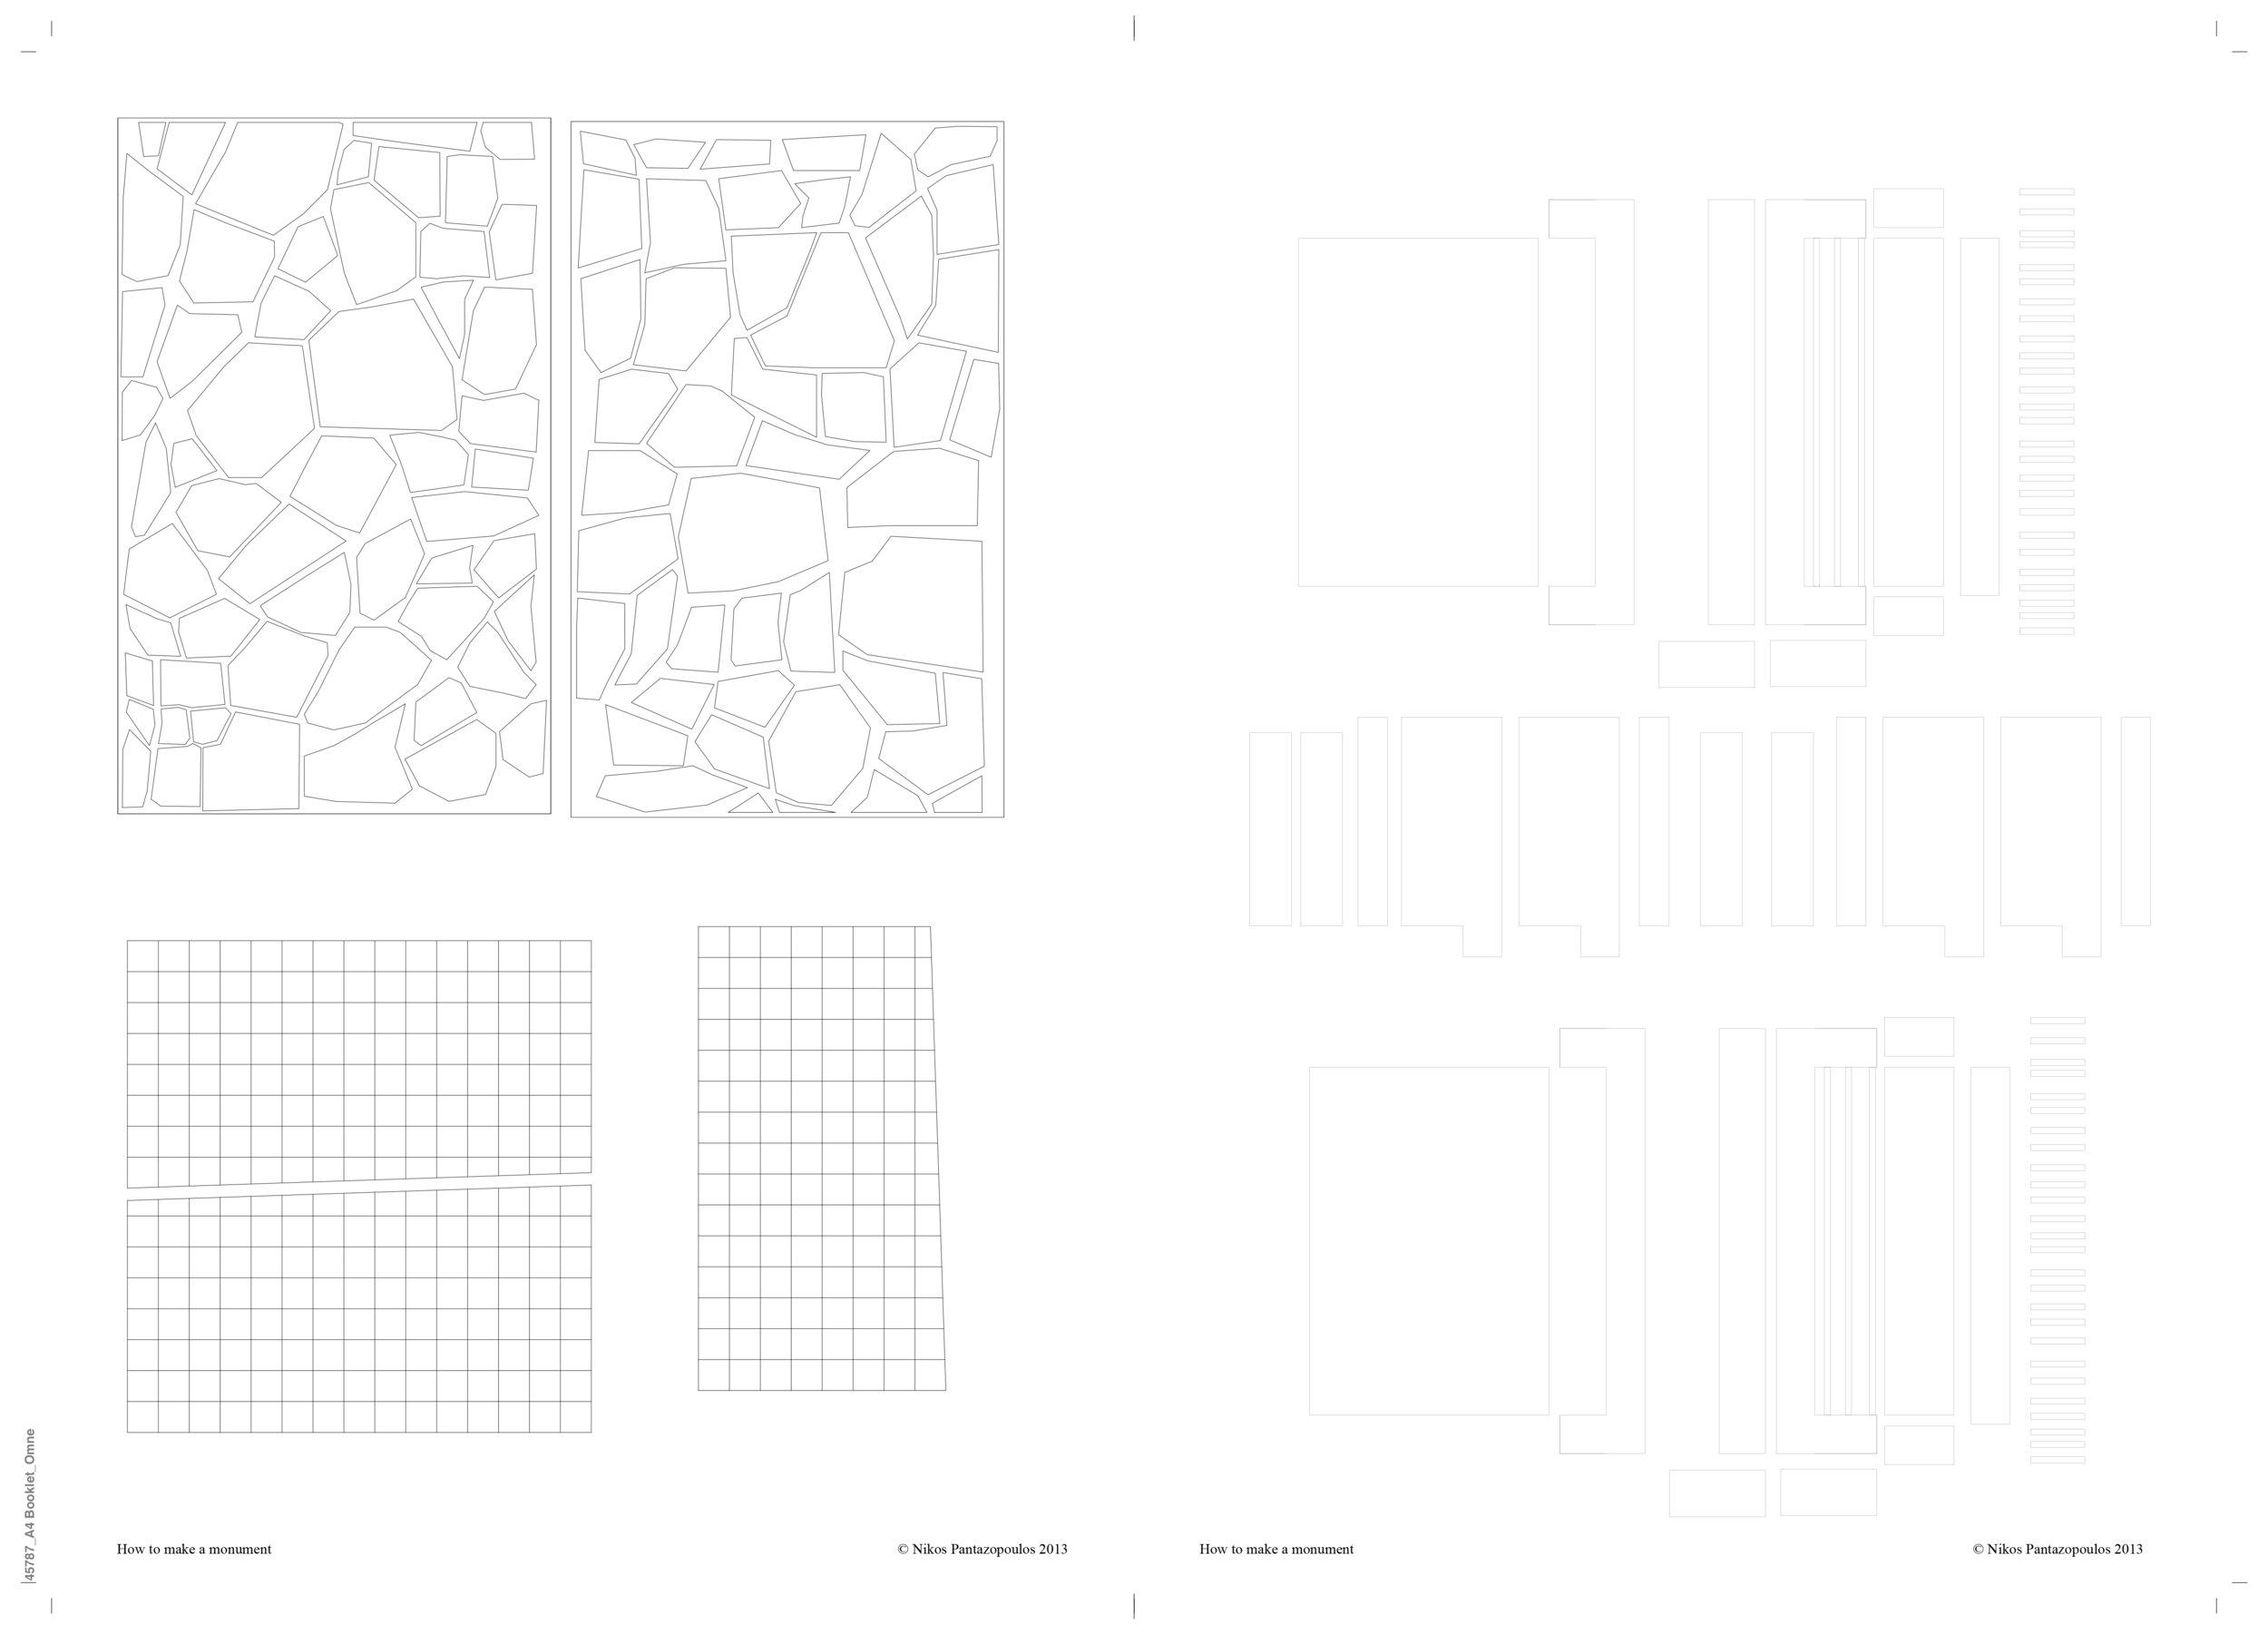 45787_A4 Booklet_Omne-2.jpg